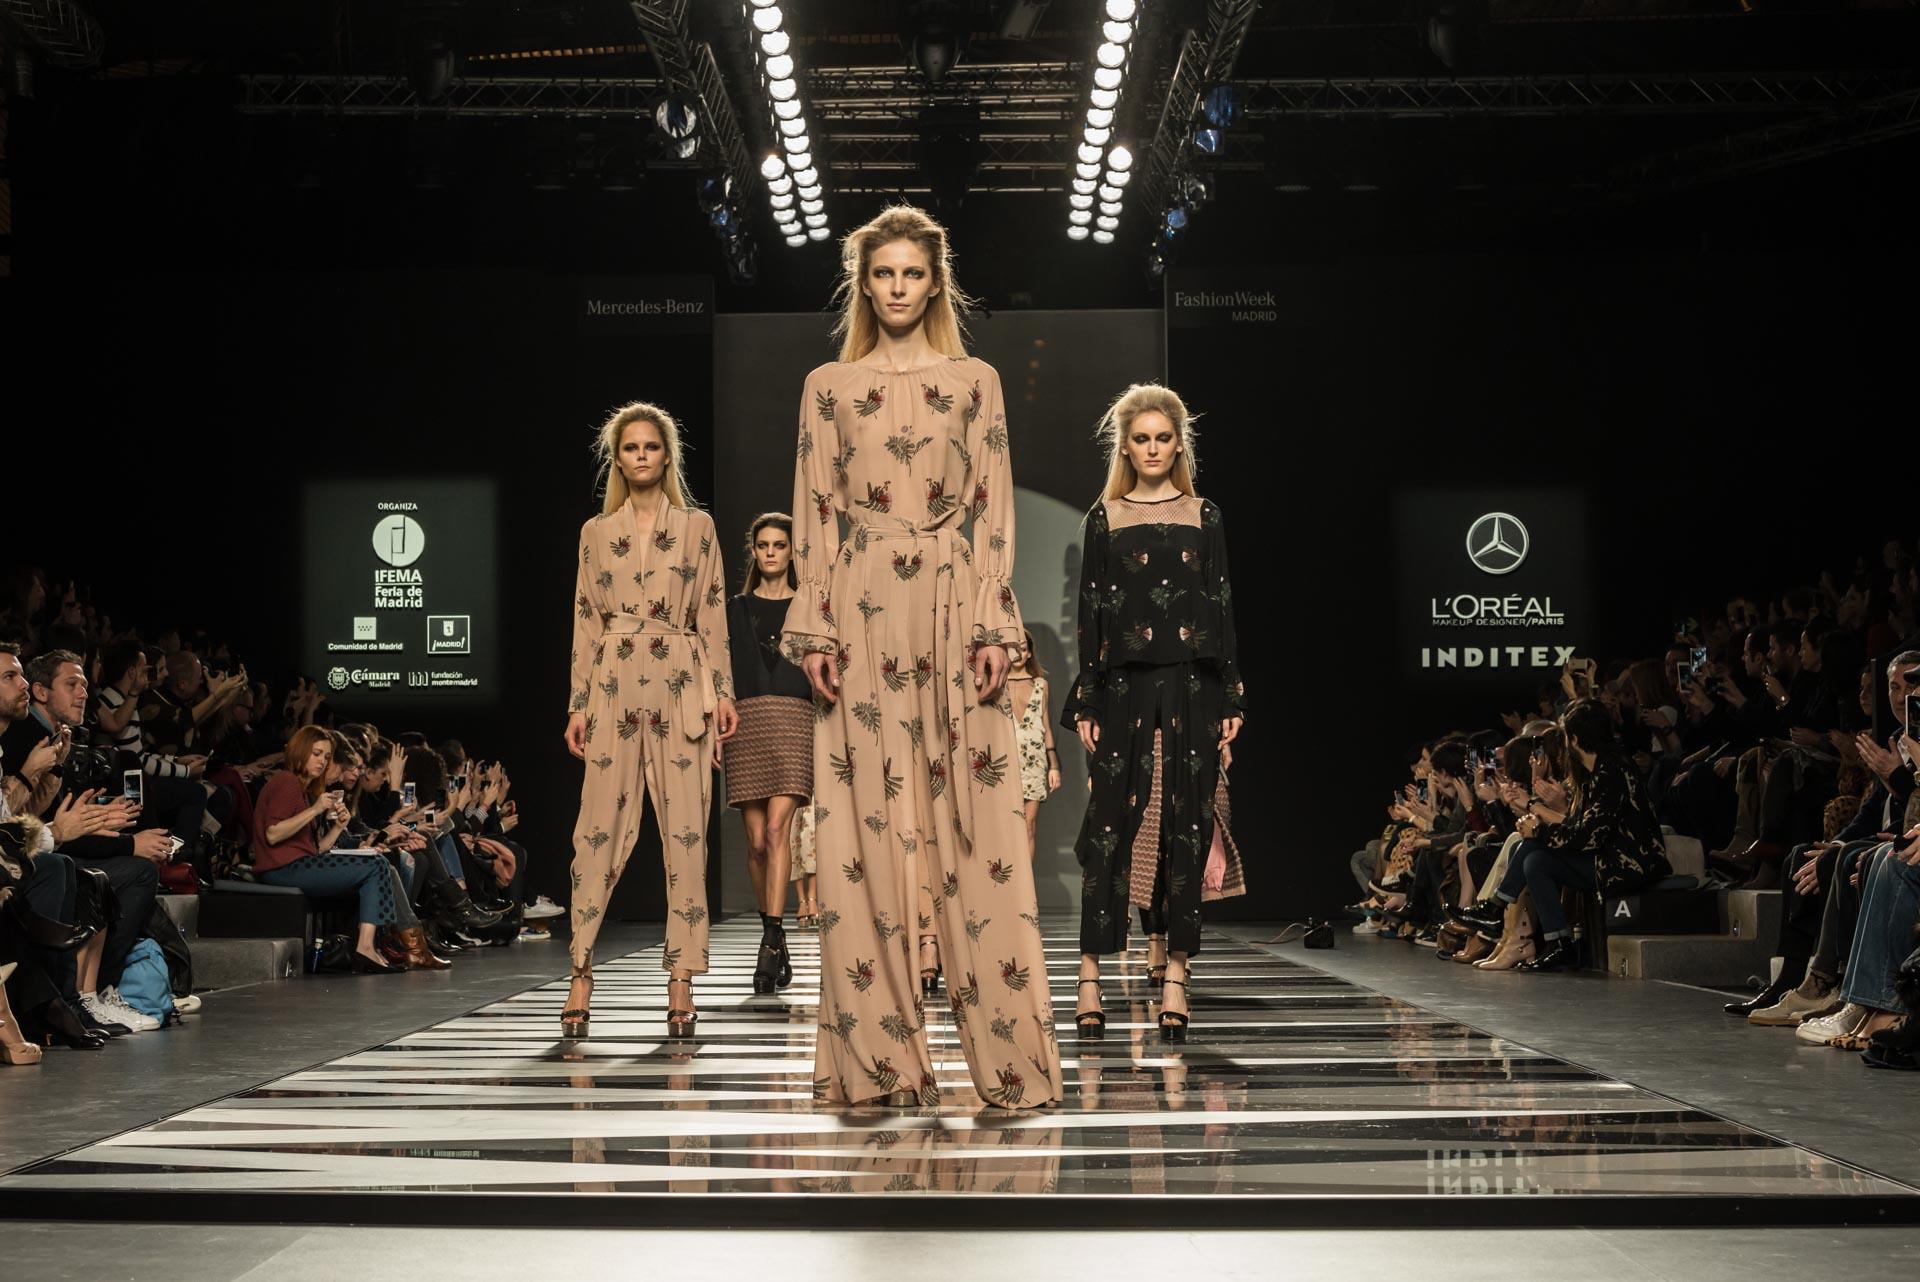 Mercedes benz fashion week video 32